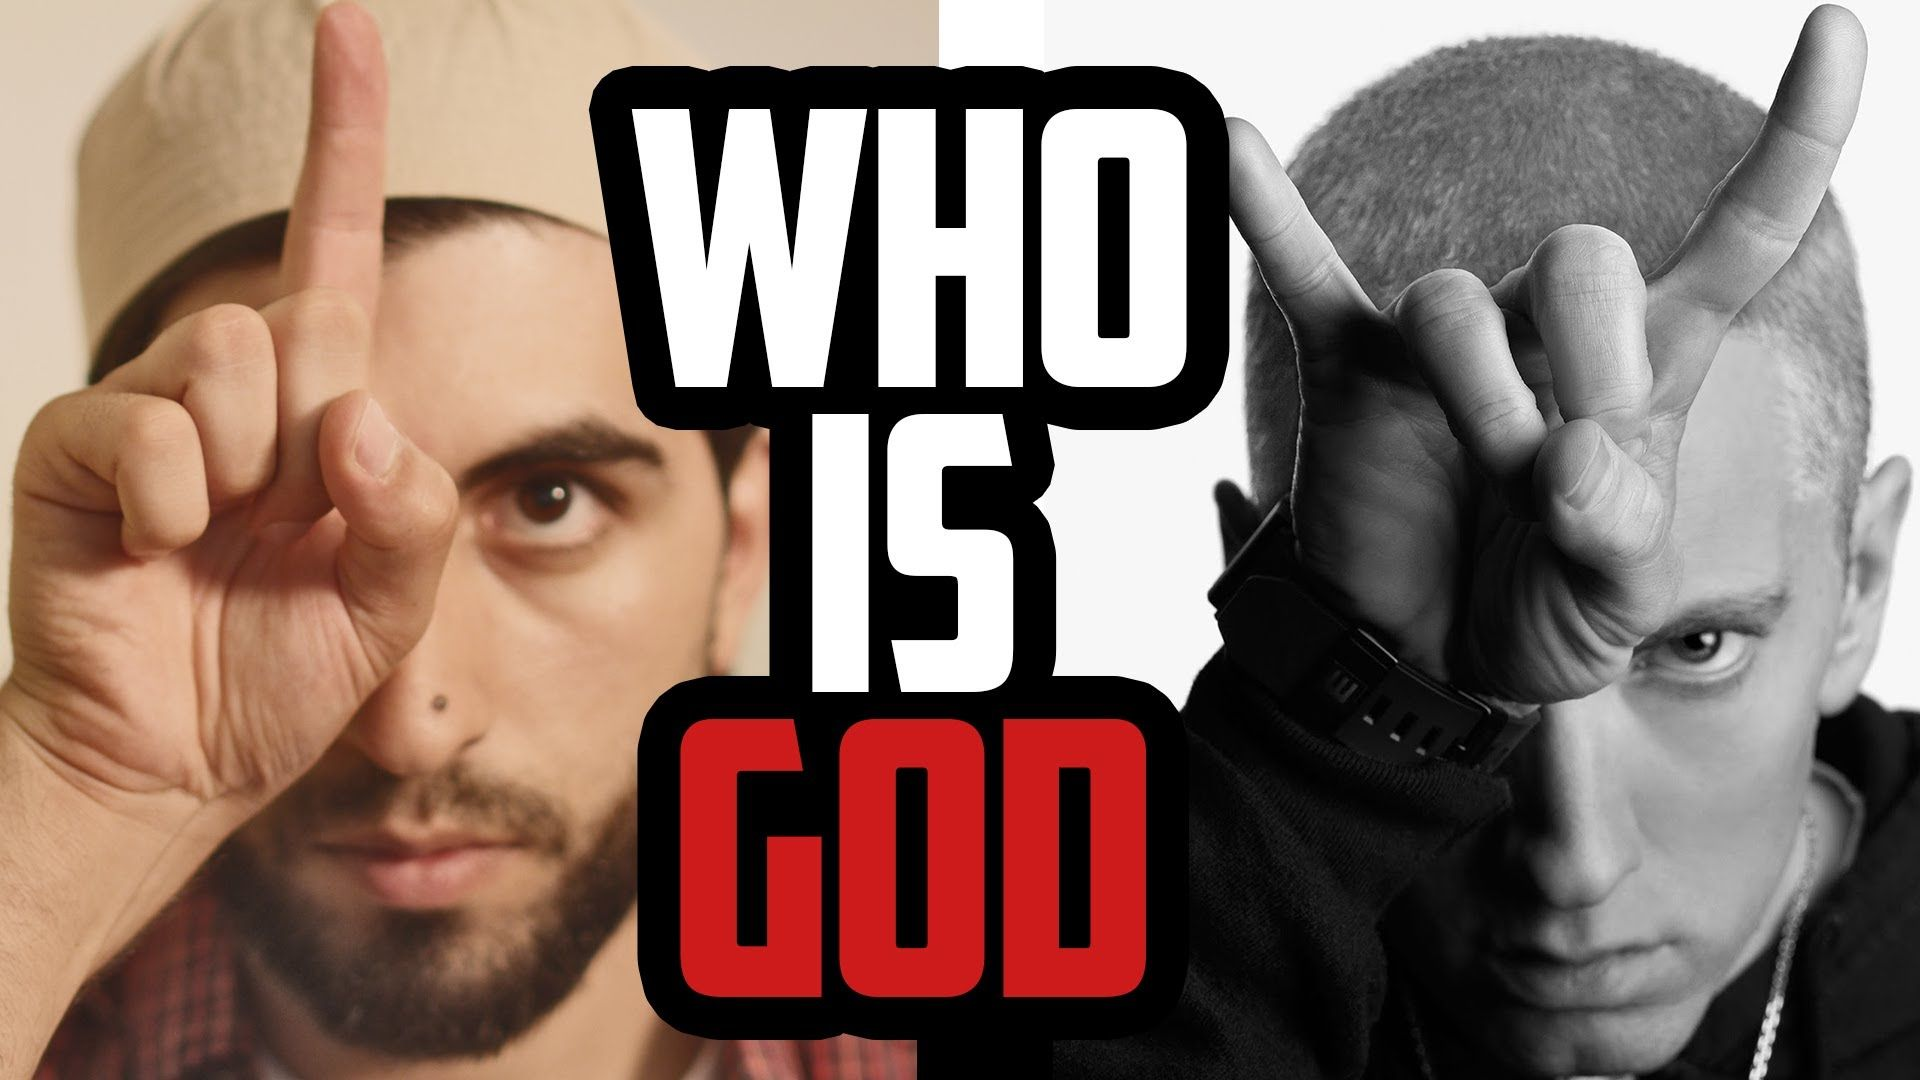 Satan Vs God Wallpaper Satan vs god wallpaper god